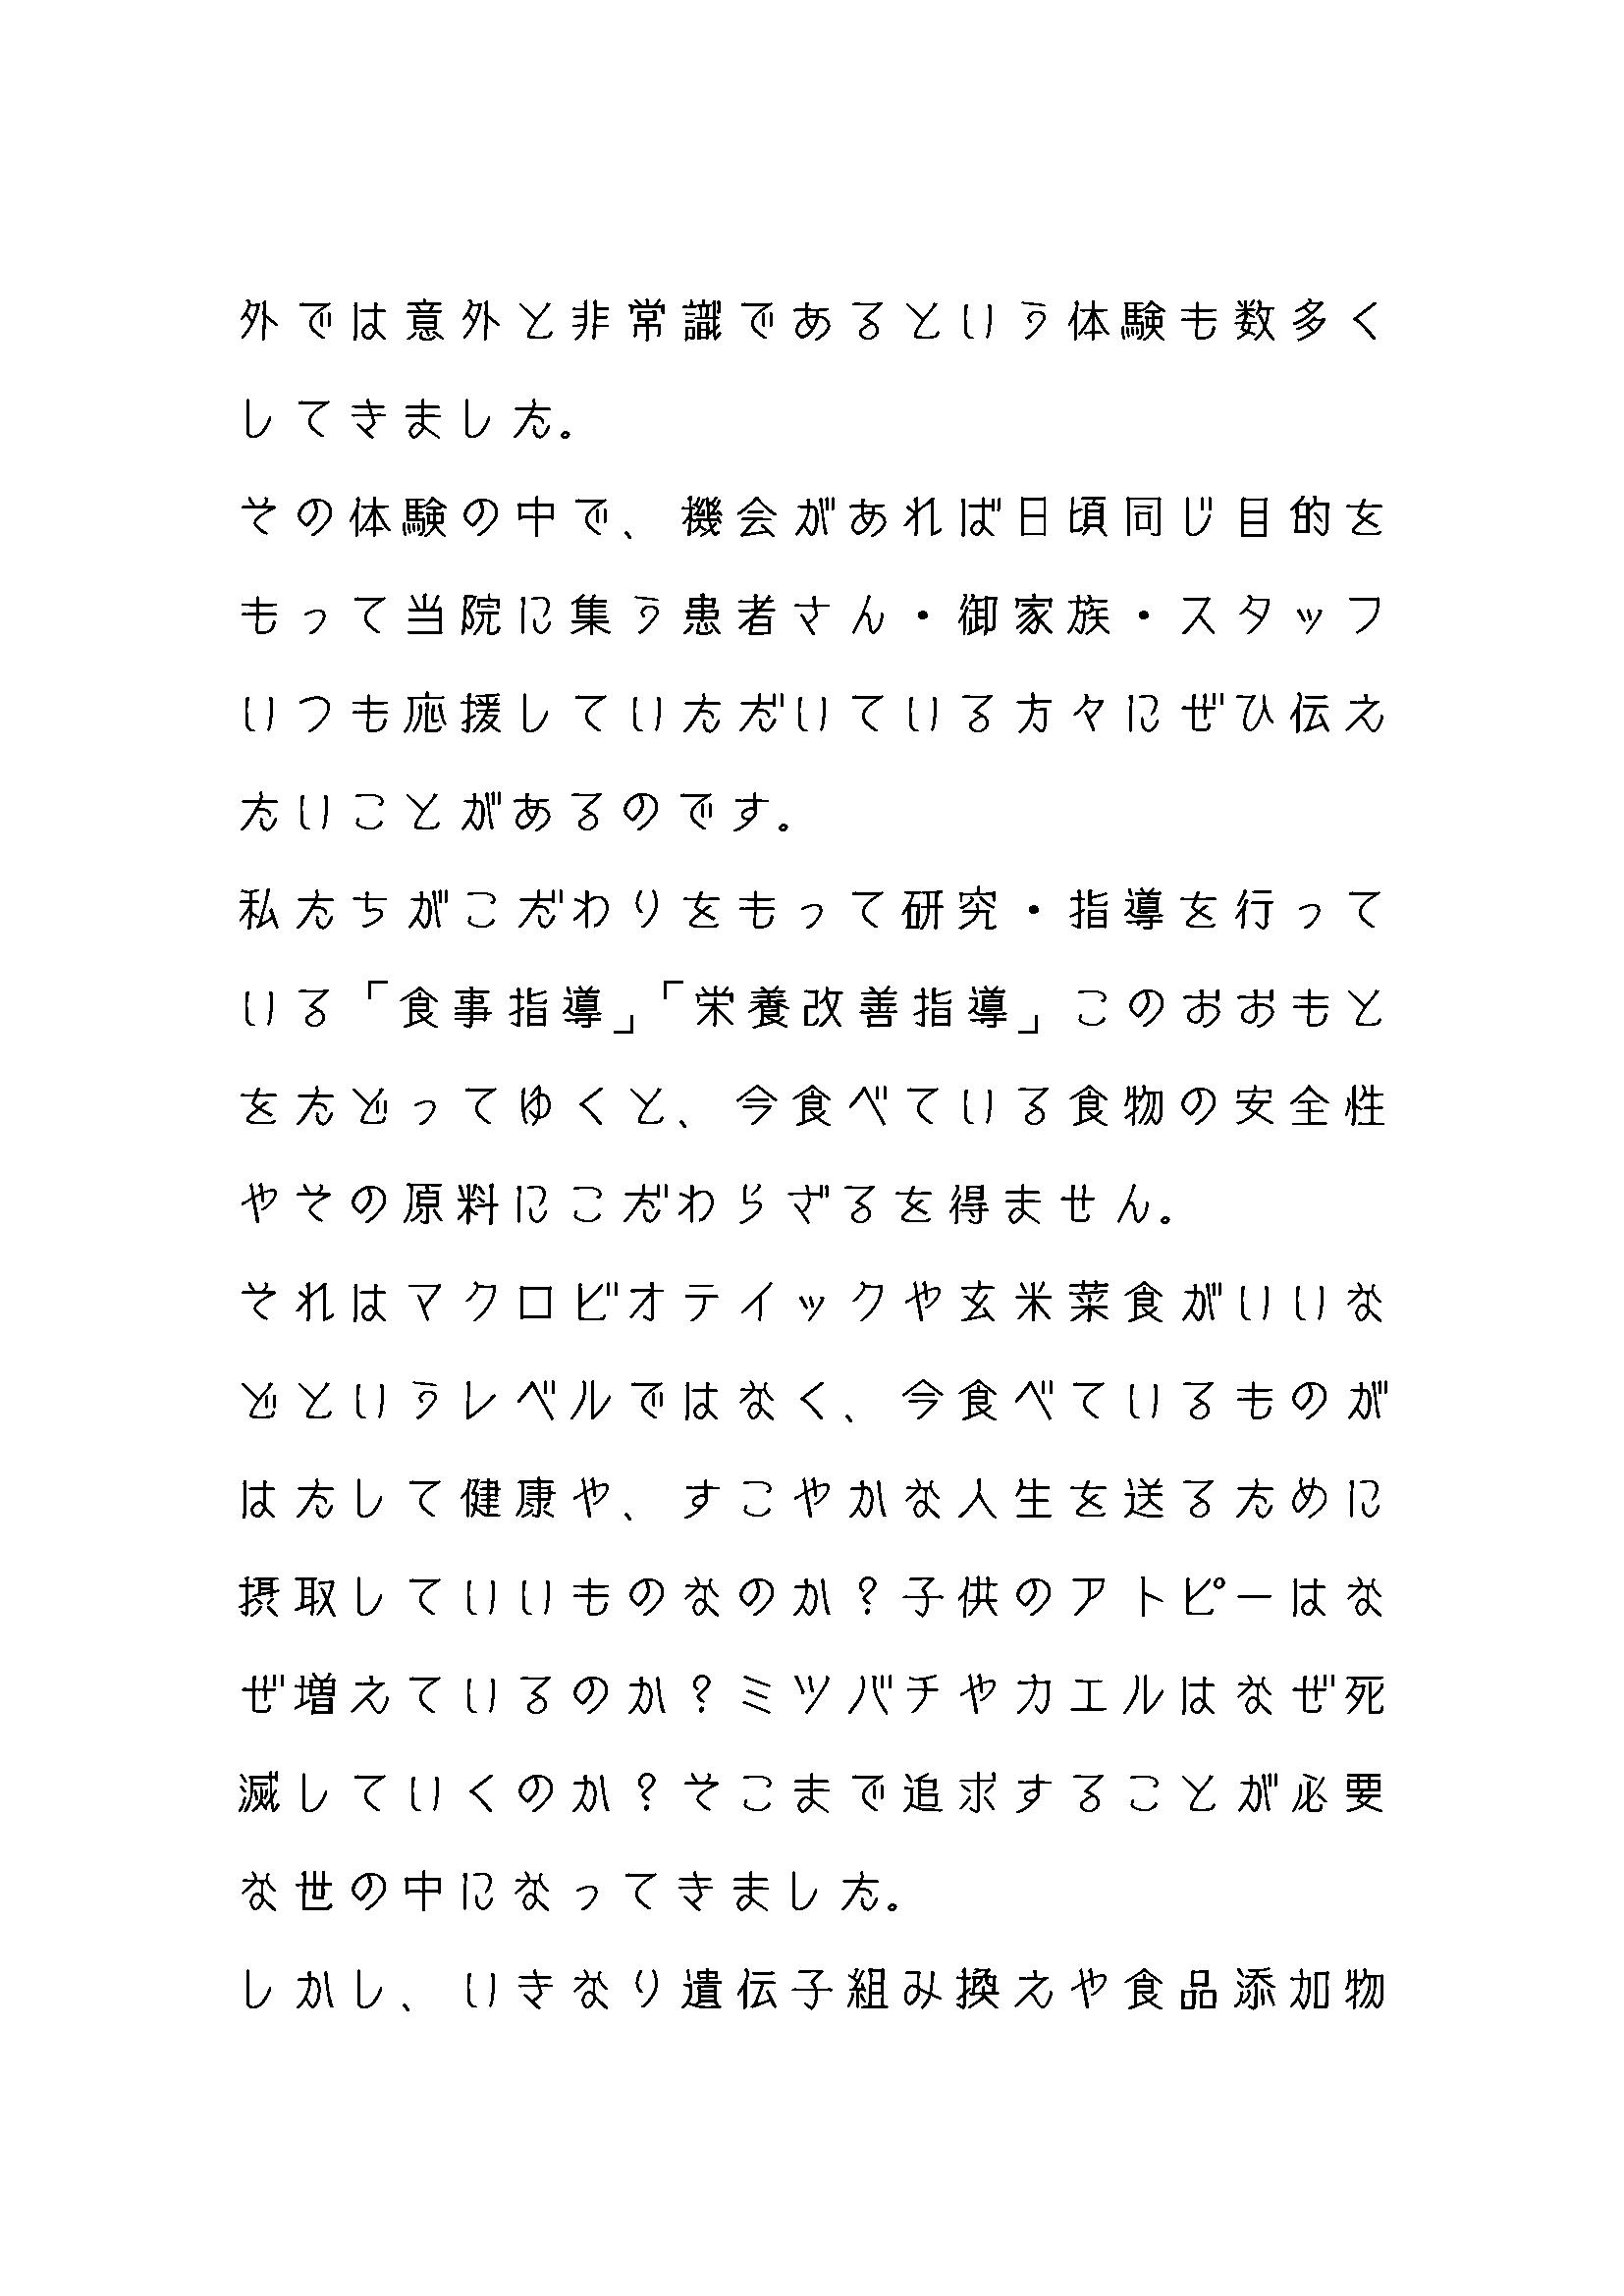 世界食文化紀行_ページ_2